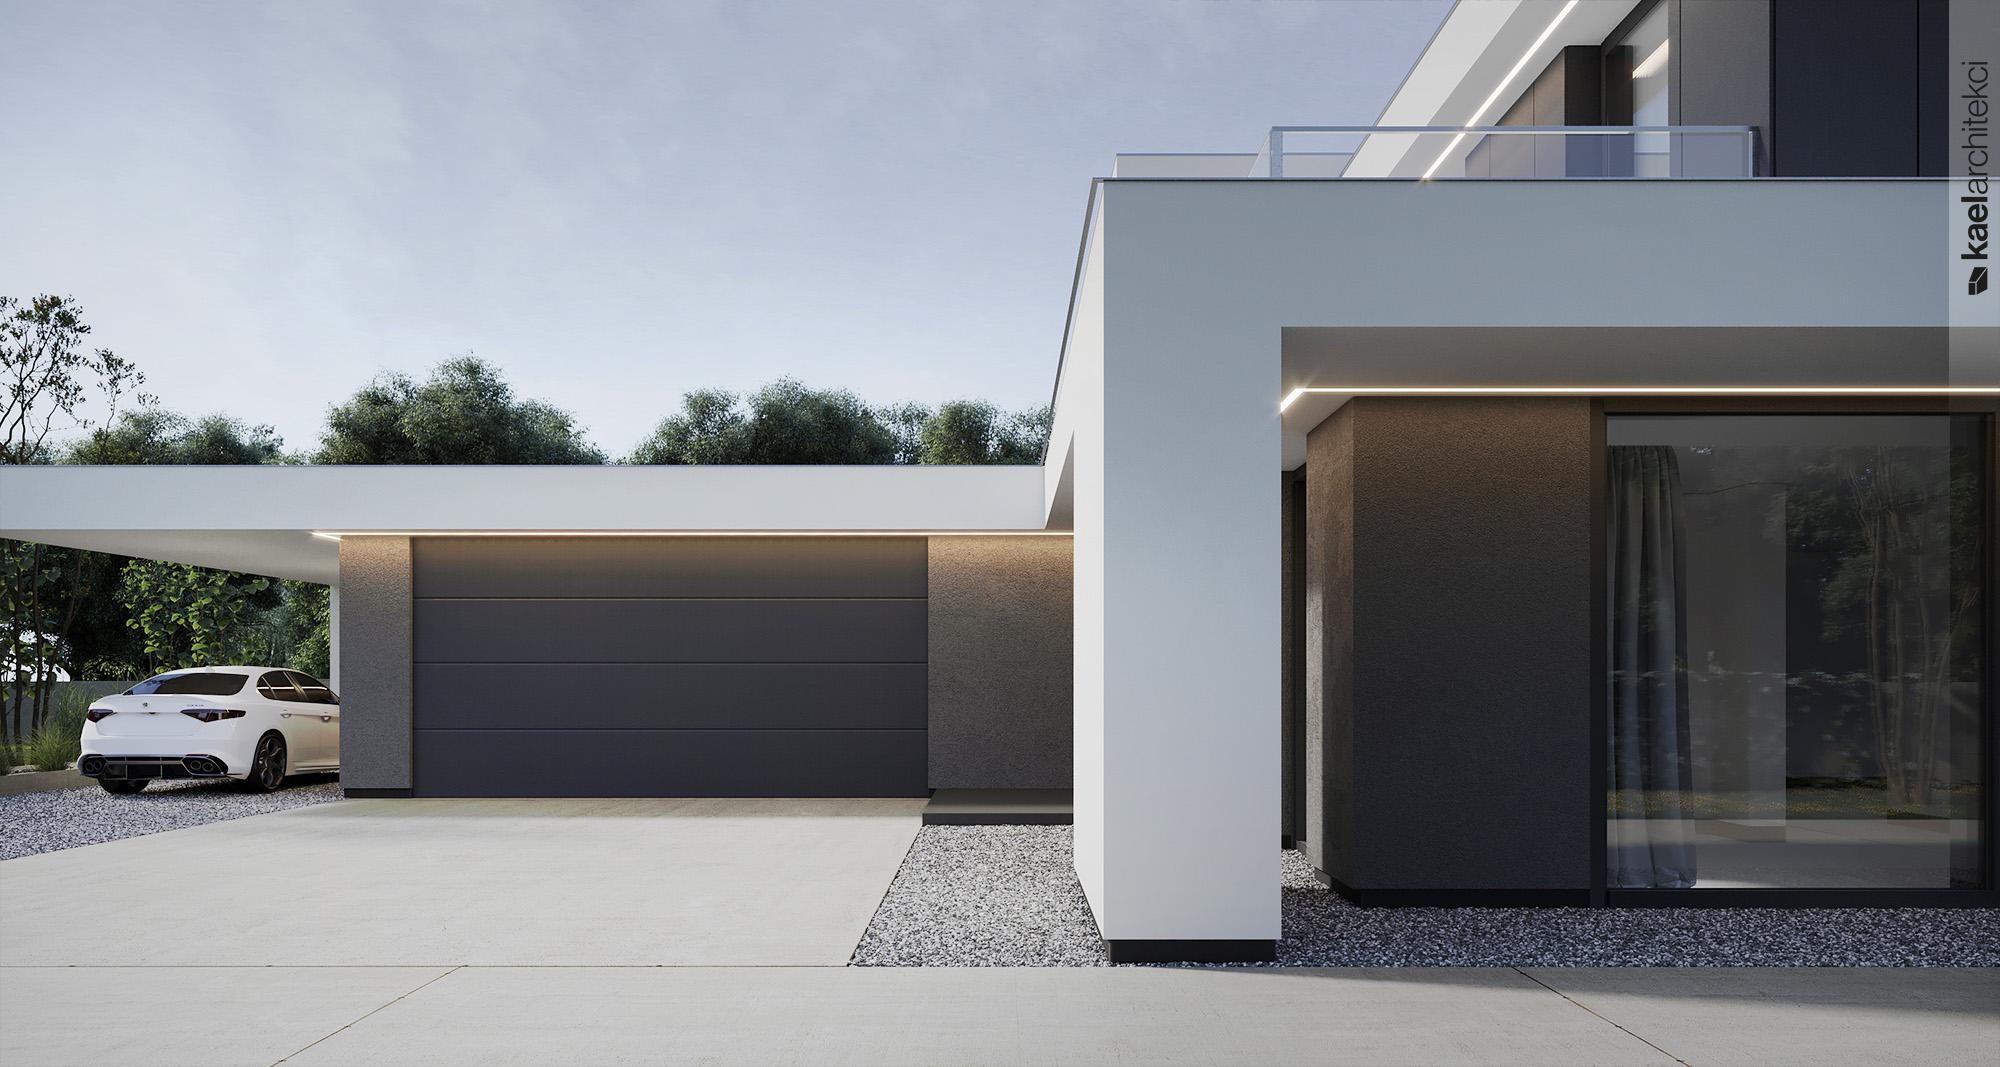 Brama garażowa bez nadproża